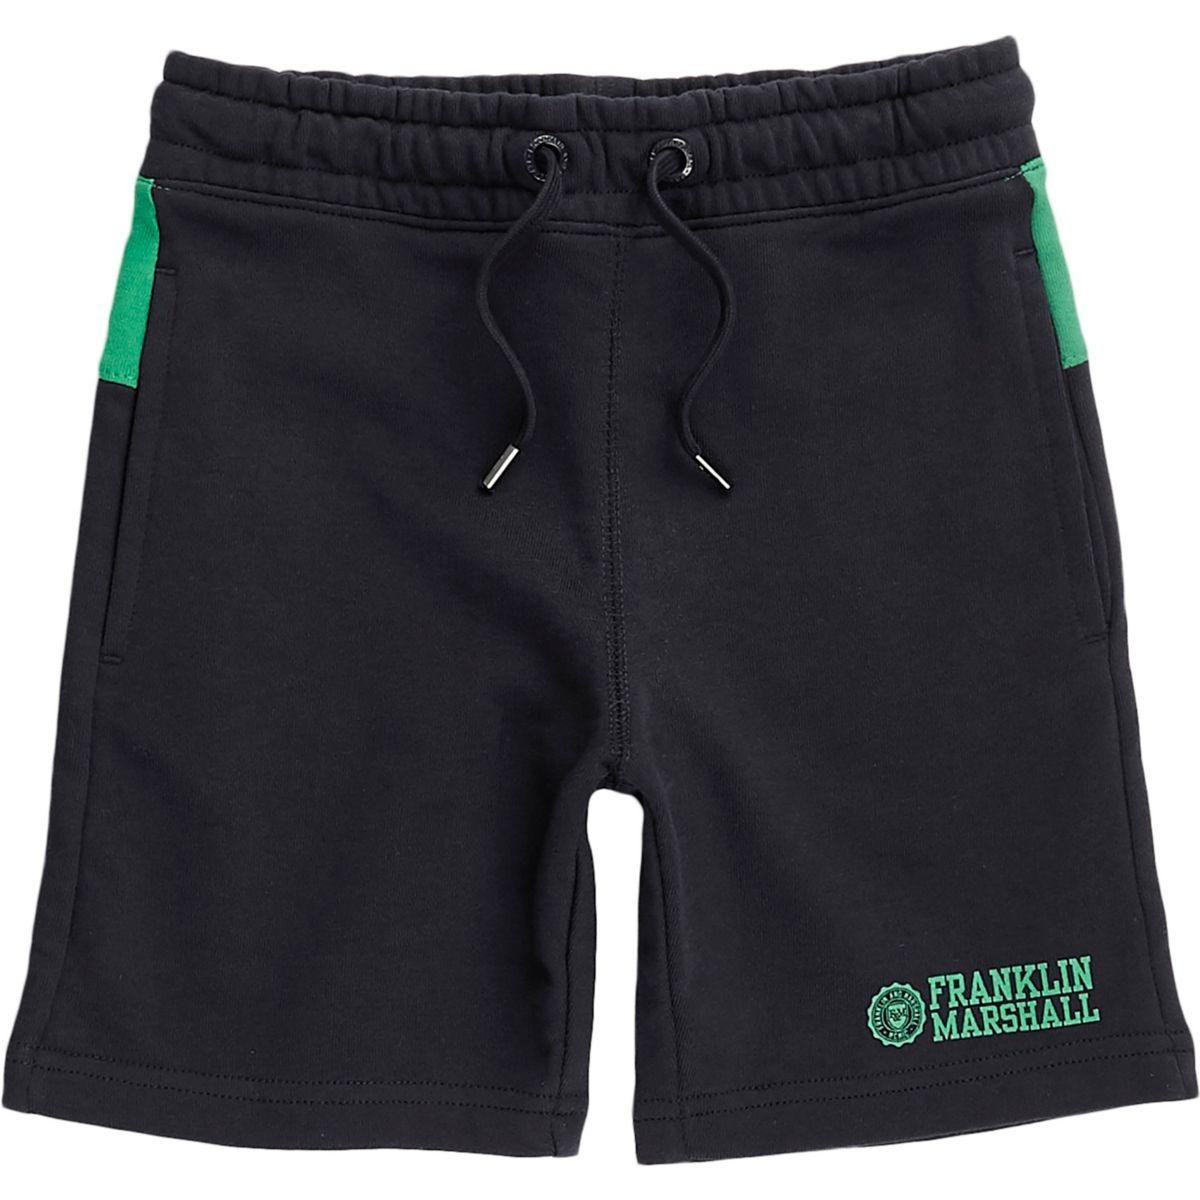 Boys navy Franklin & Marshall jersey shorts